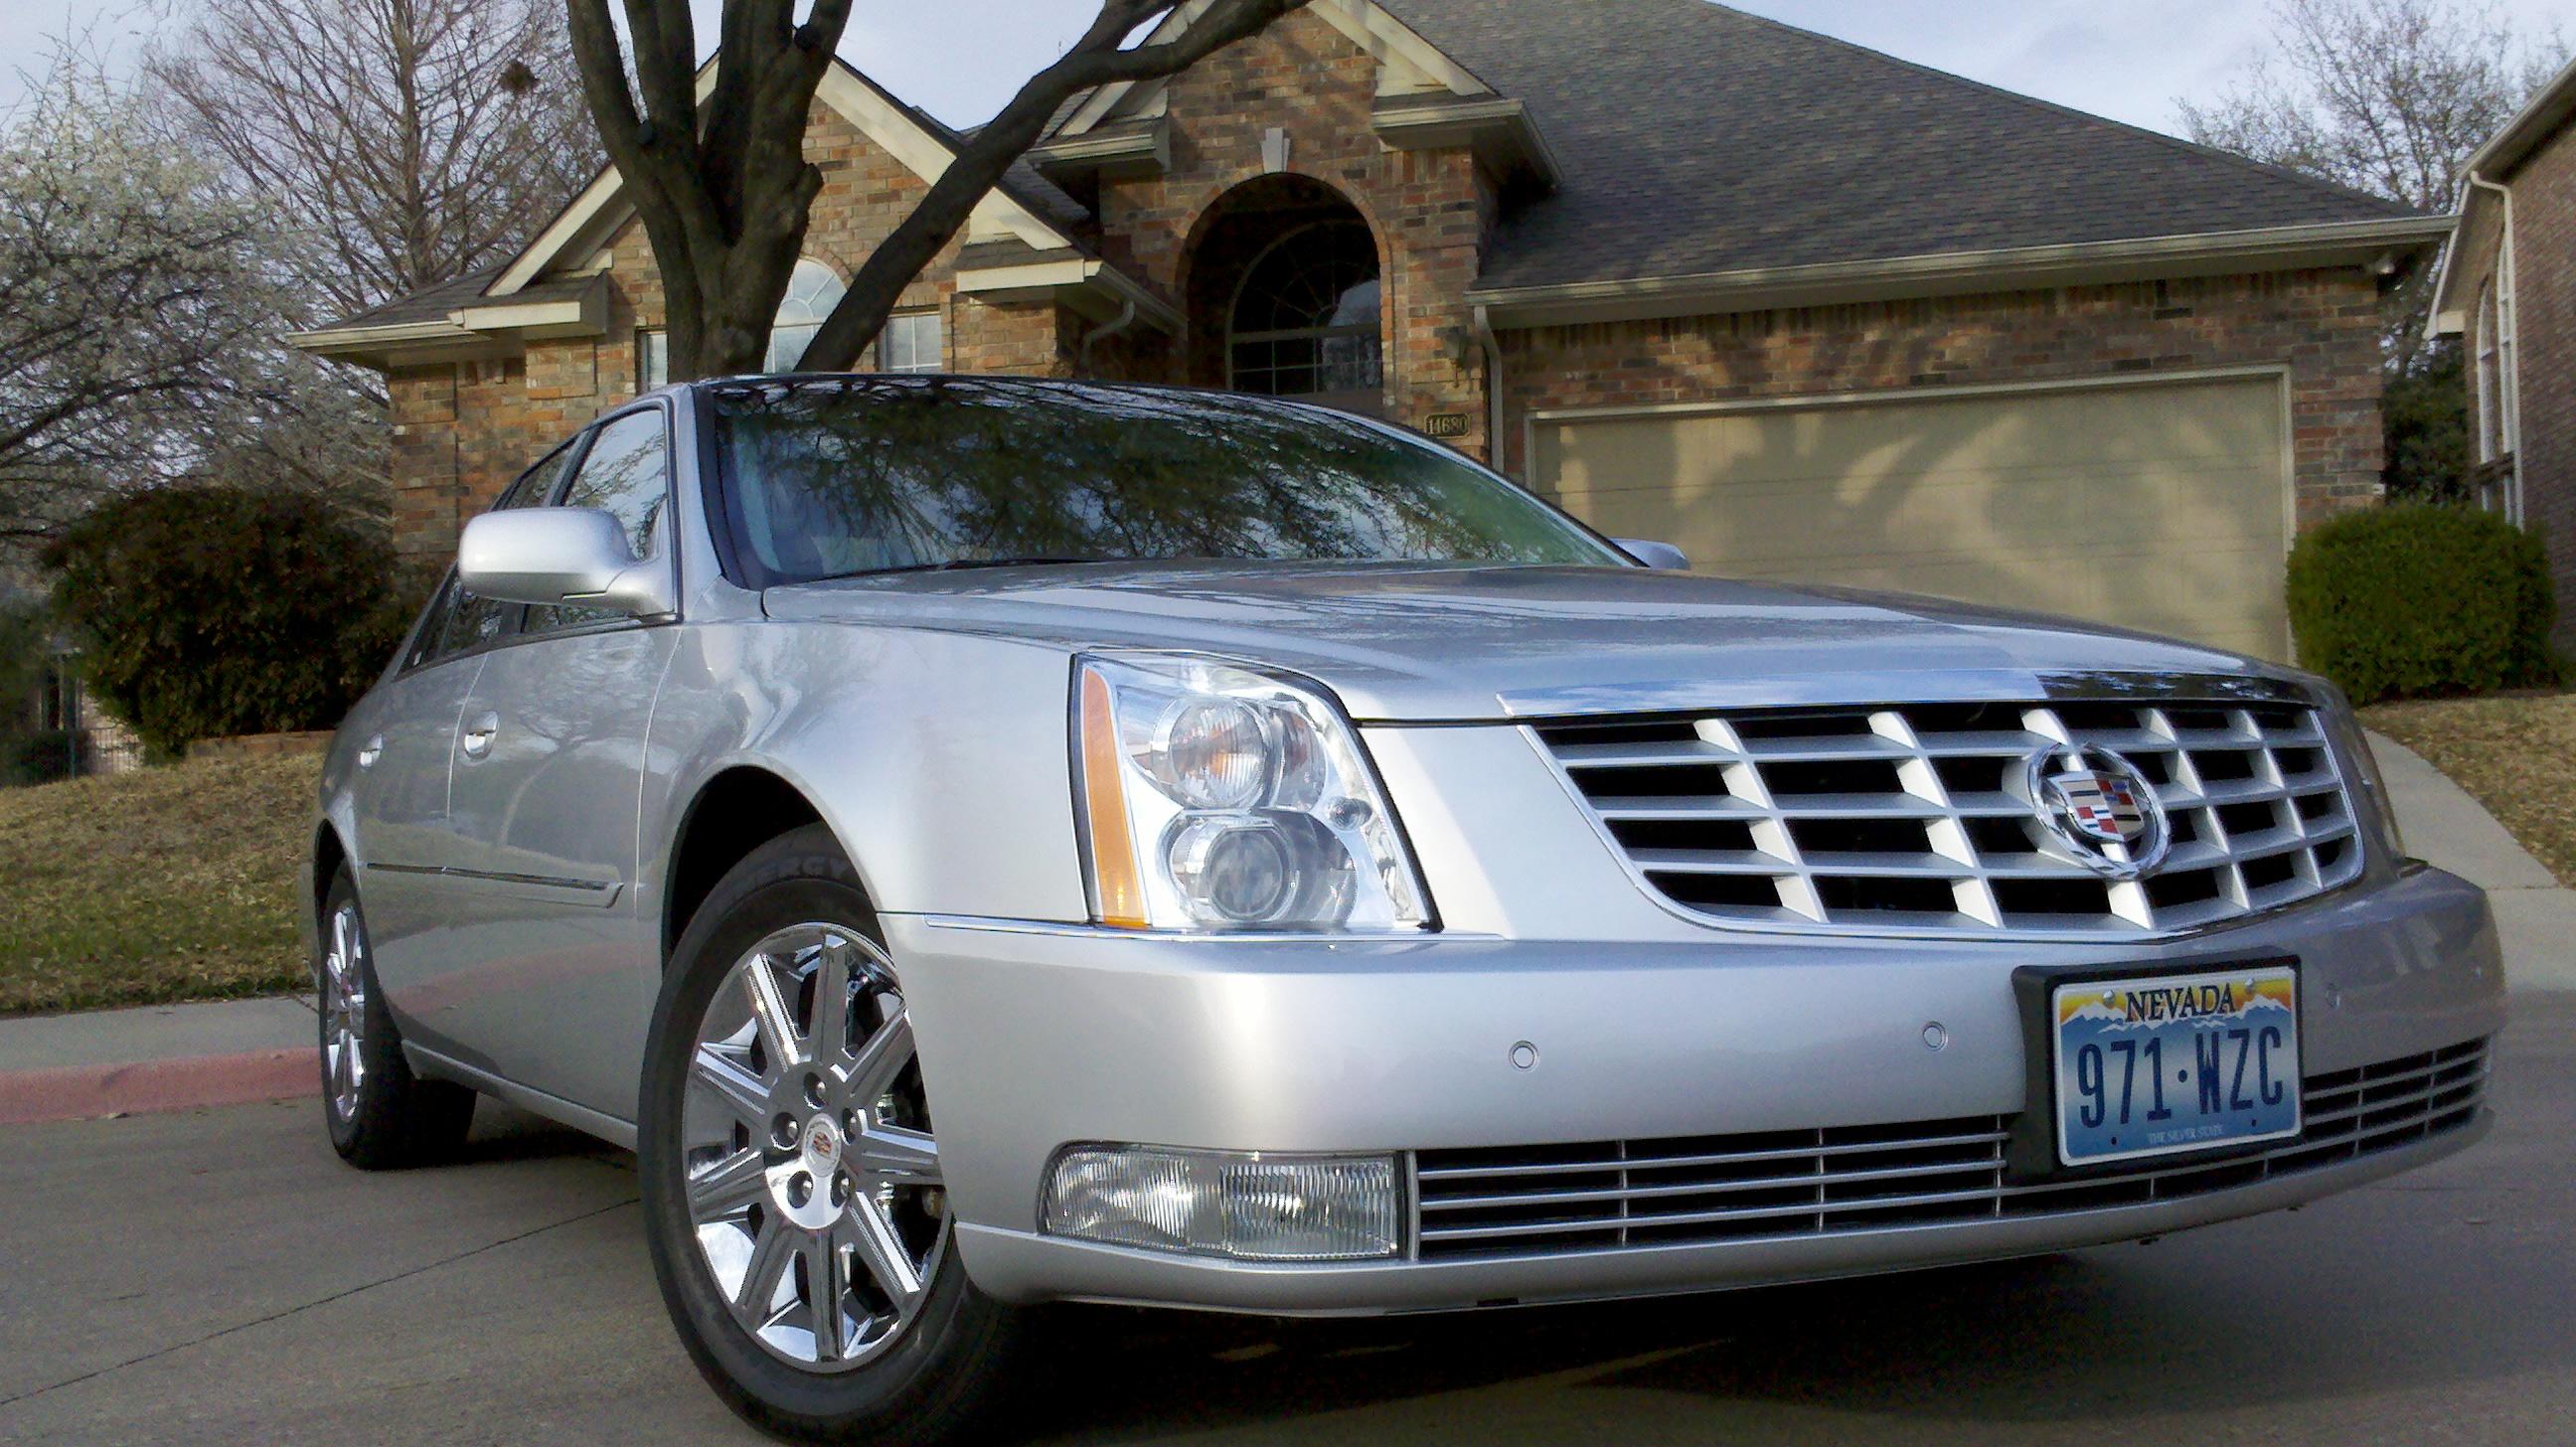 DTS The Last Cadillac